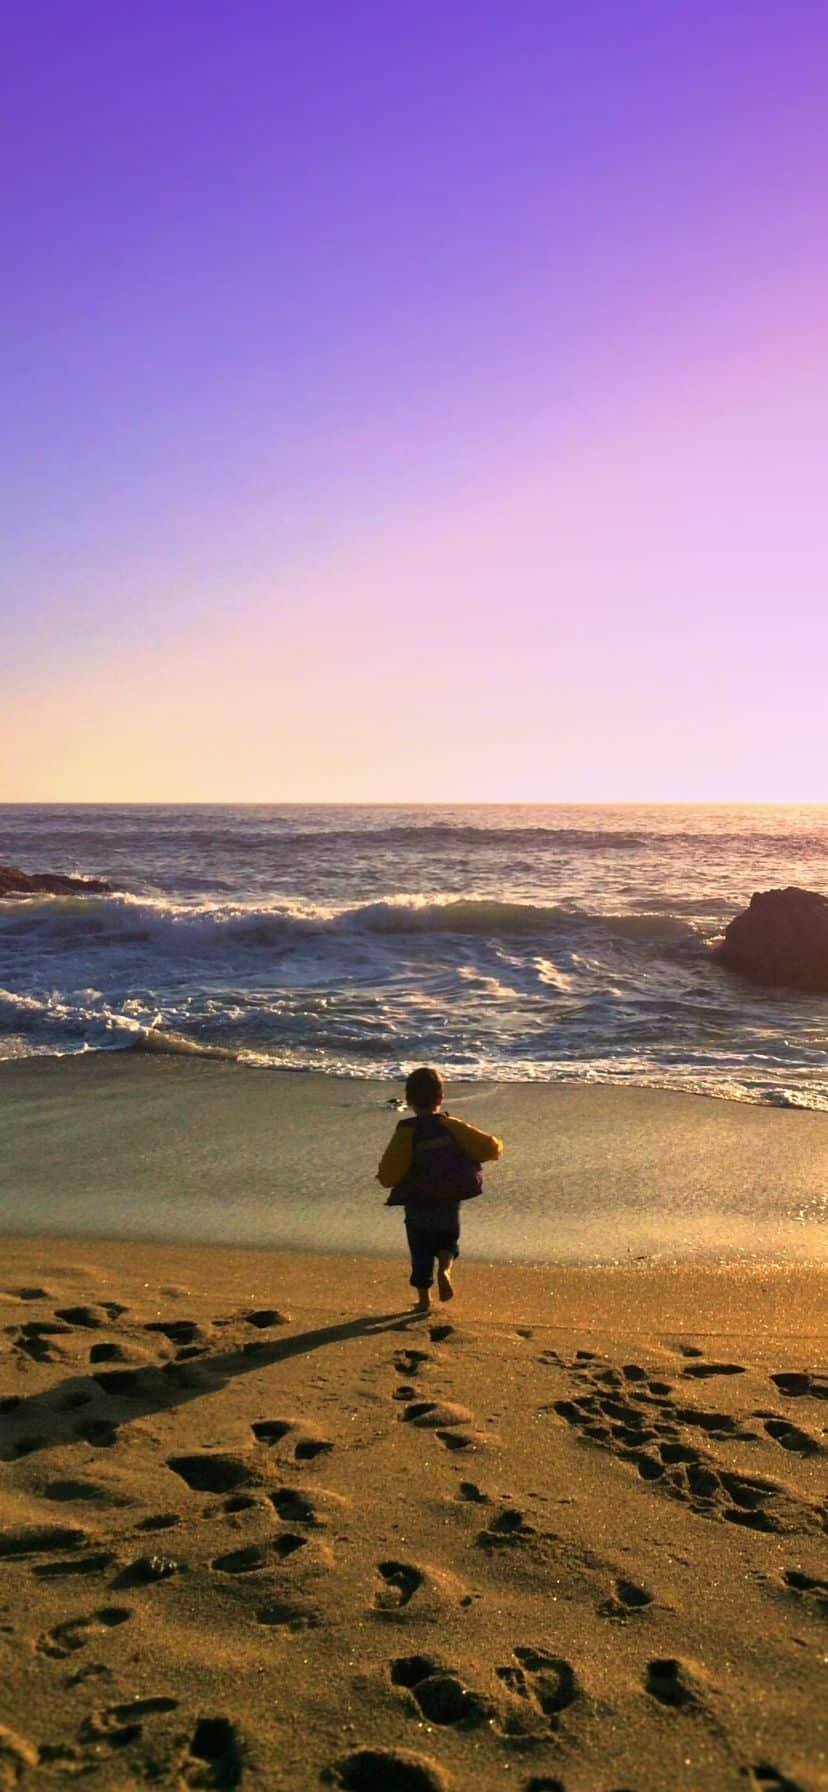 Sonoma County Beach California Coast Road Trip